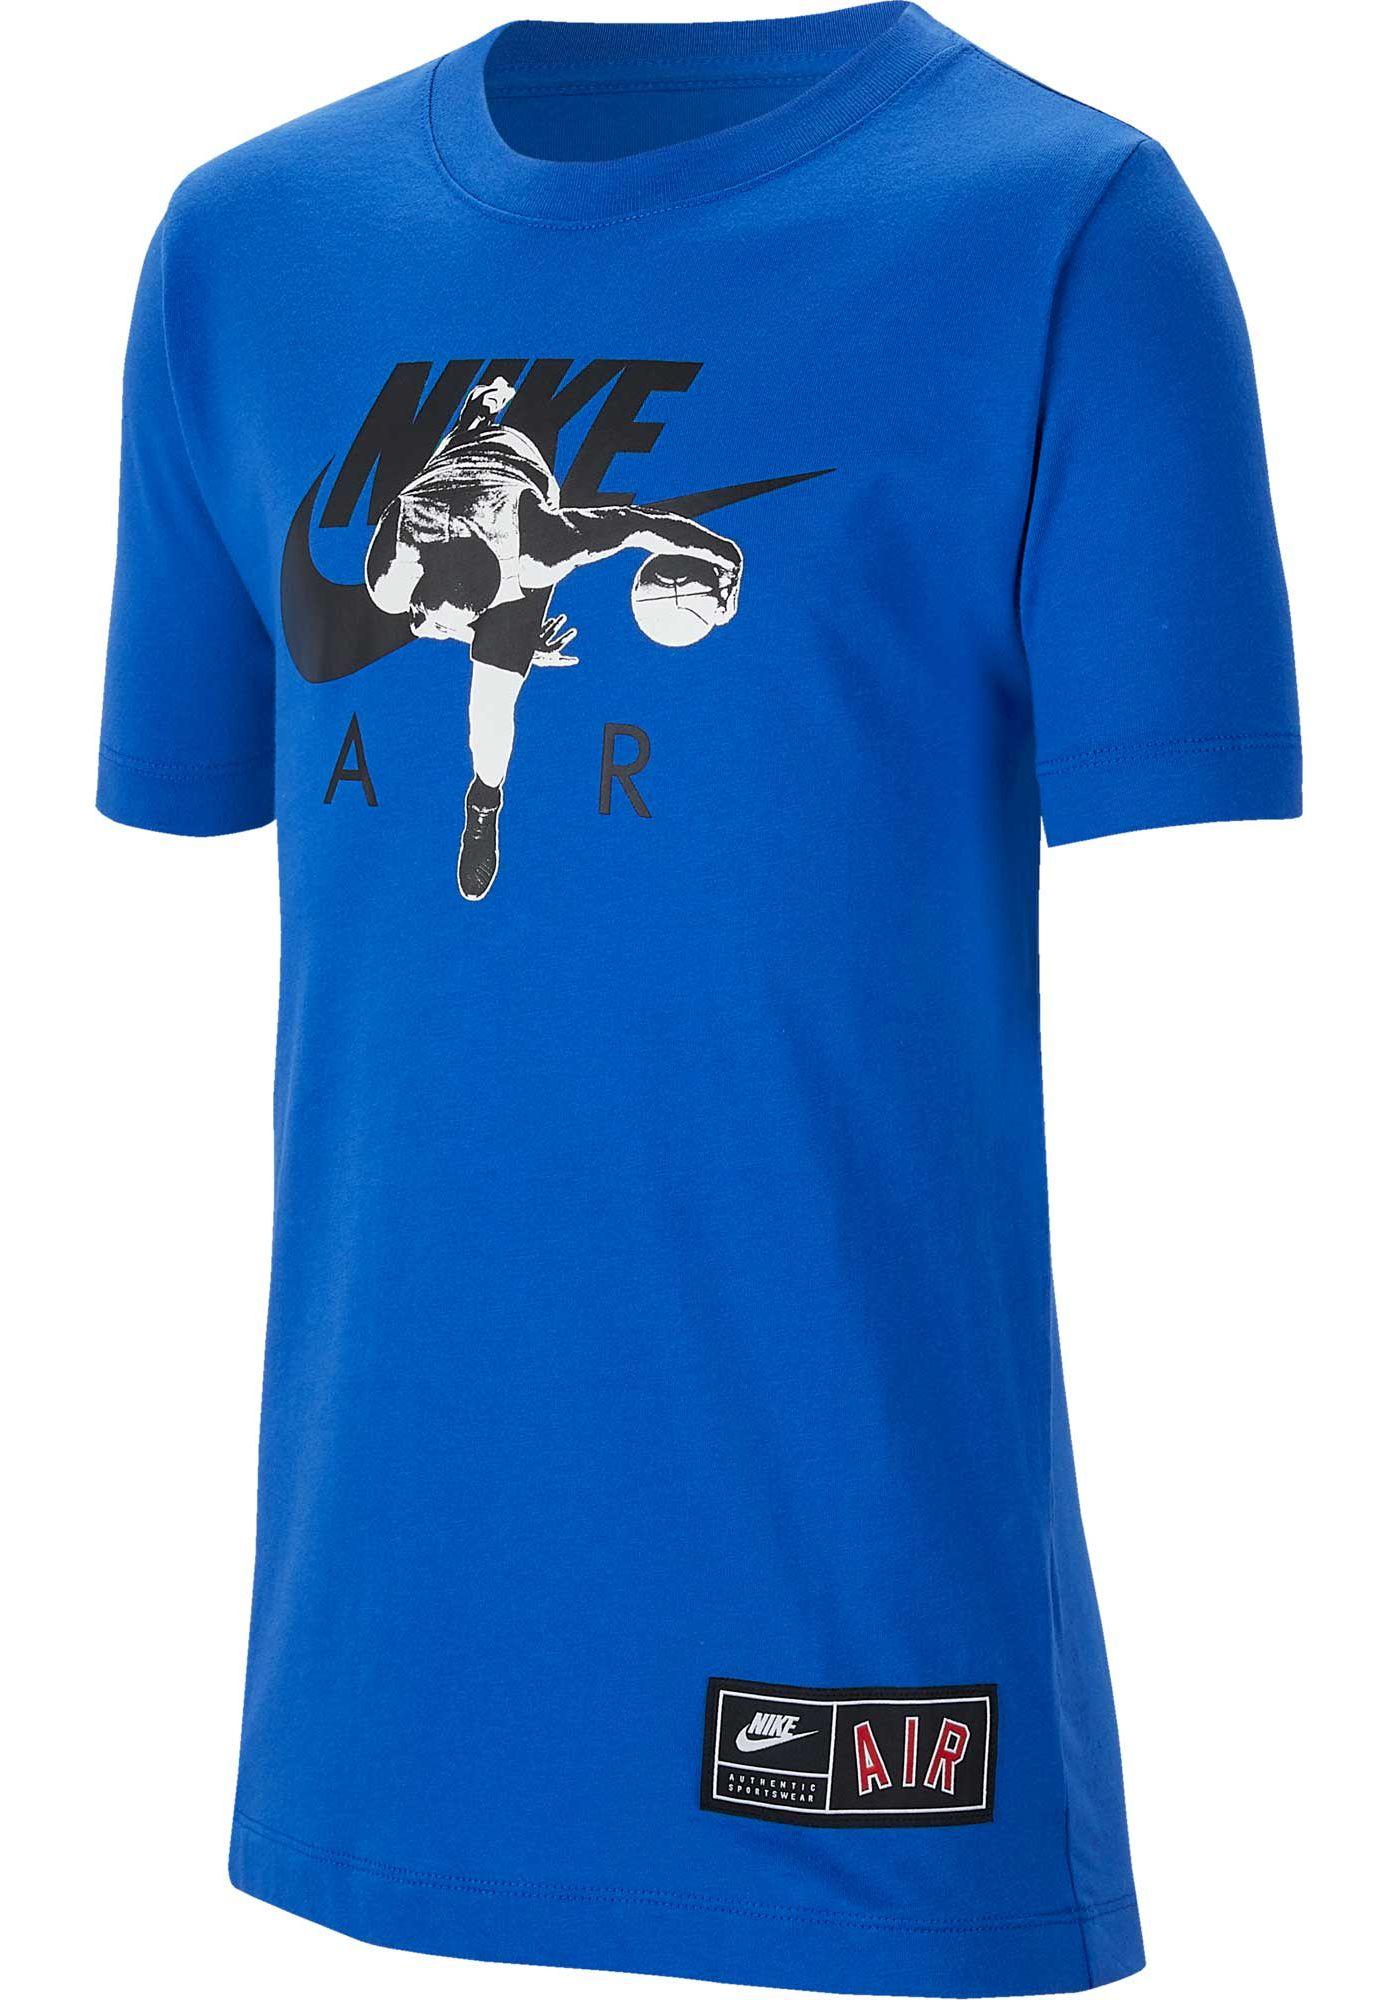 Nike Boys' Sportswear Air Photo Real Graphic T-Shirt